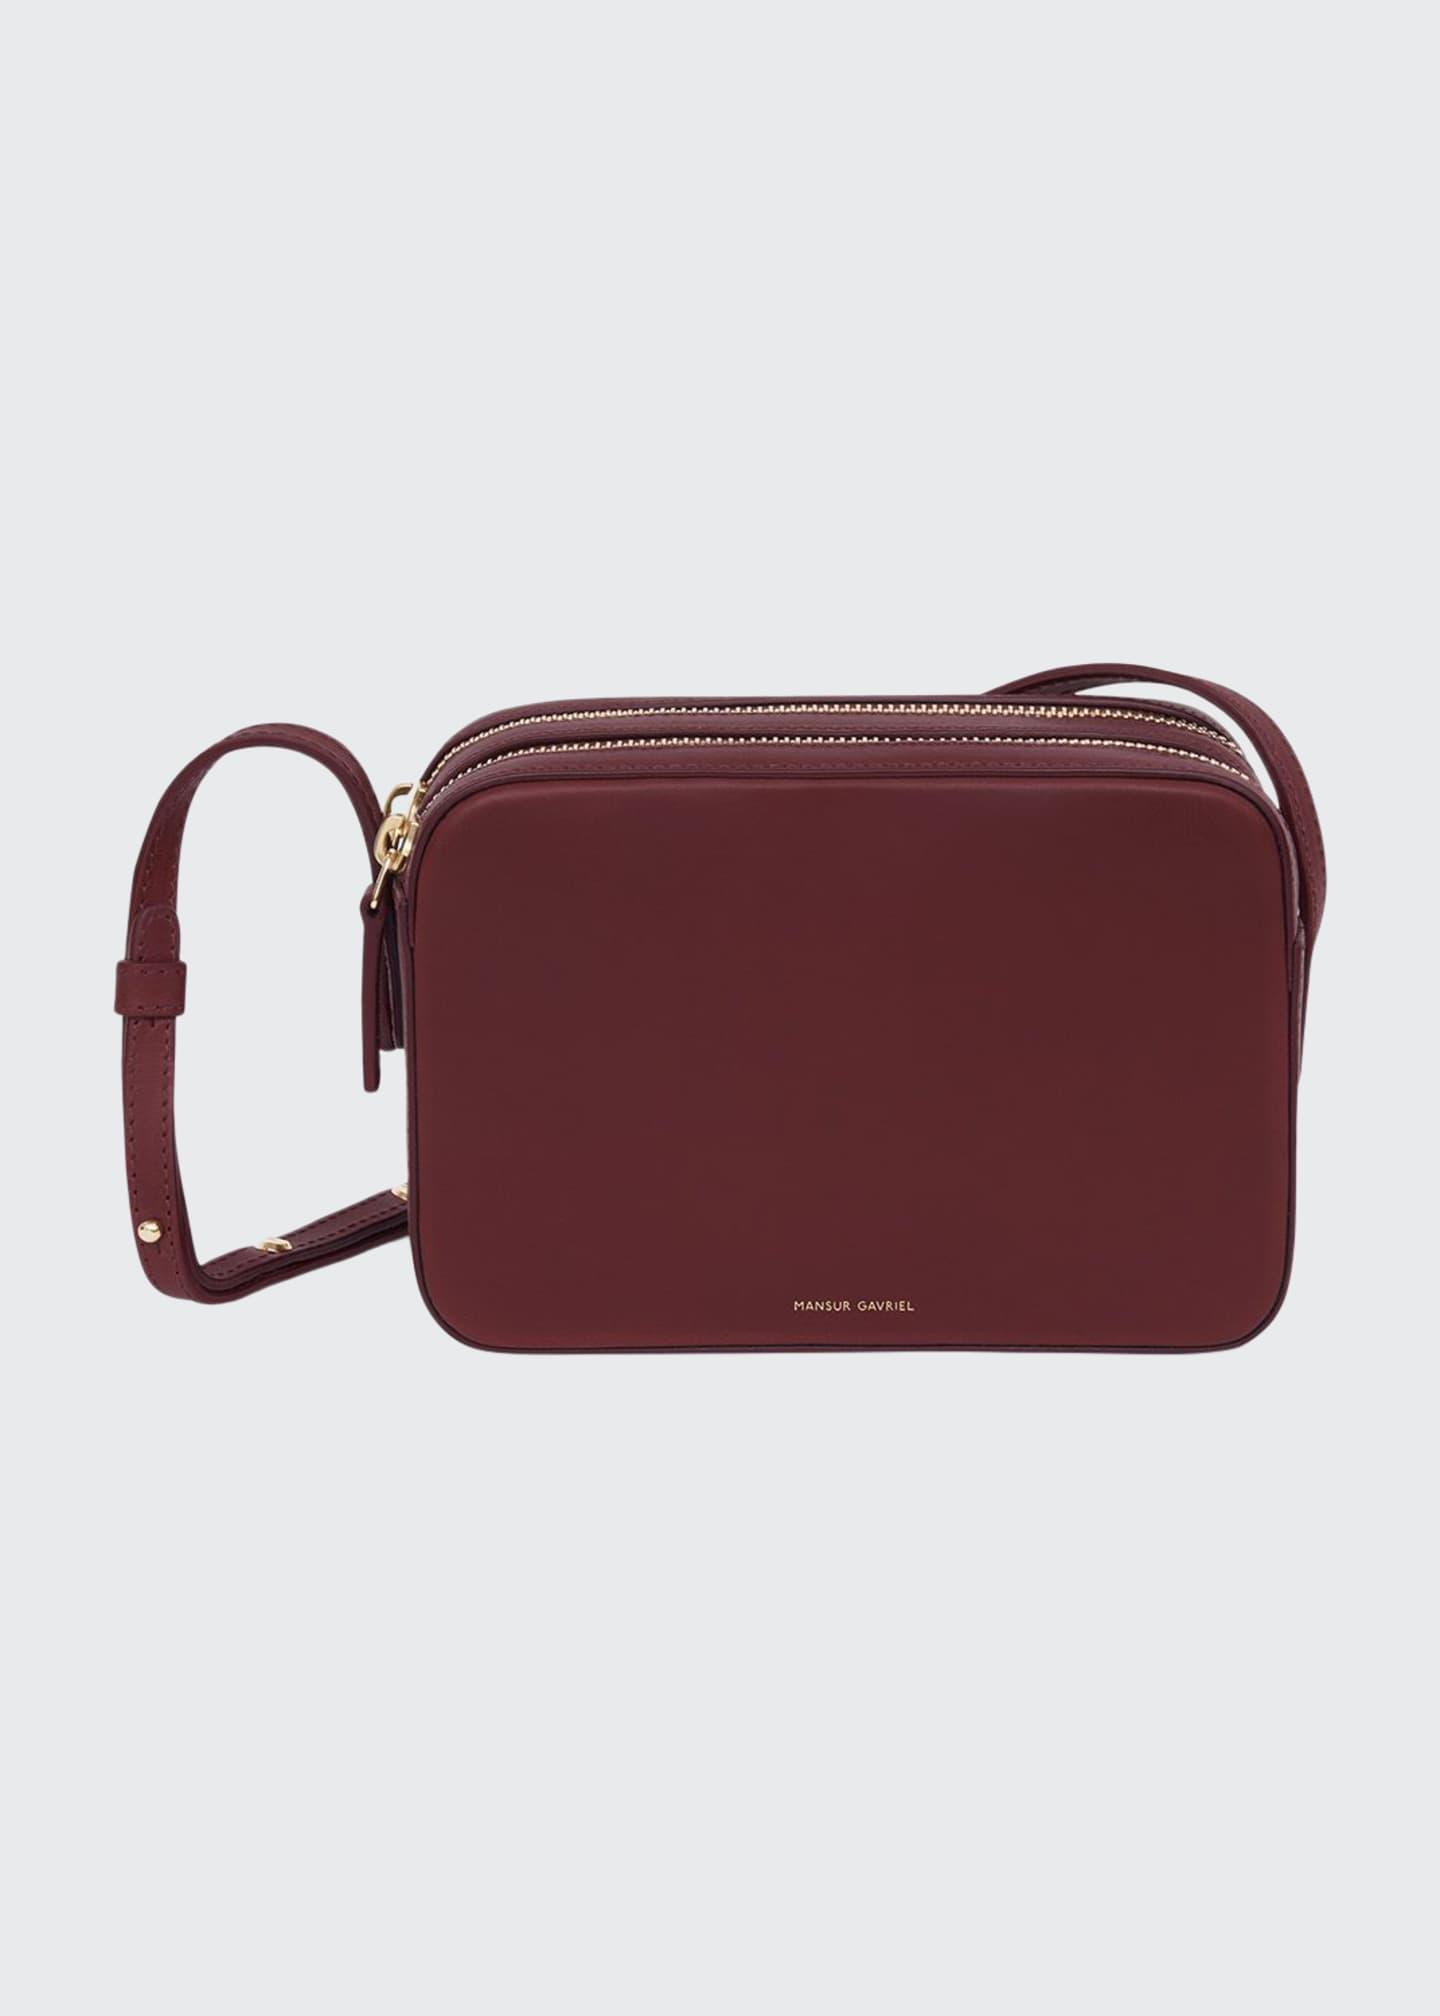 Mansur Gavriel Vegetable-Tanned Zip Crossbody Bag